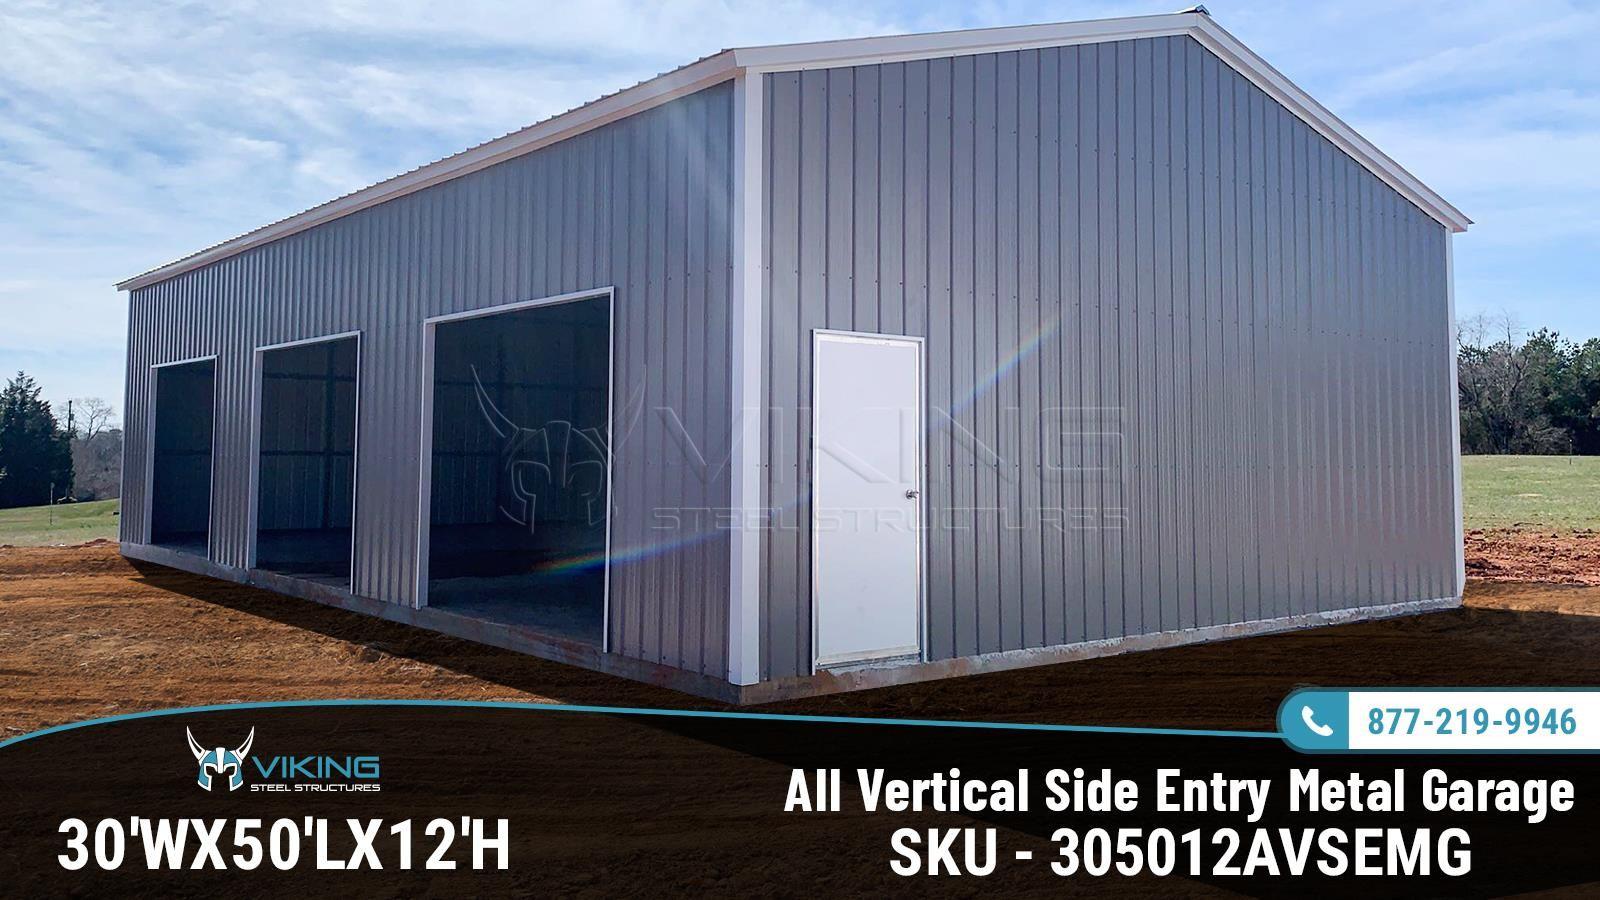 30x50x12 All Vertical Side Entry Metal Garage Metal